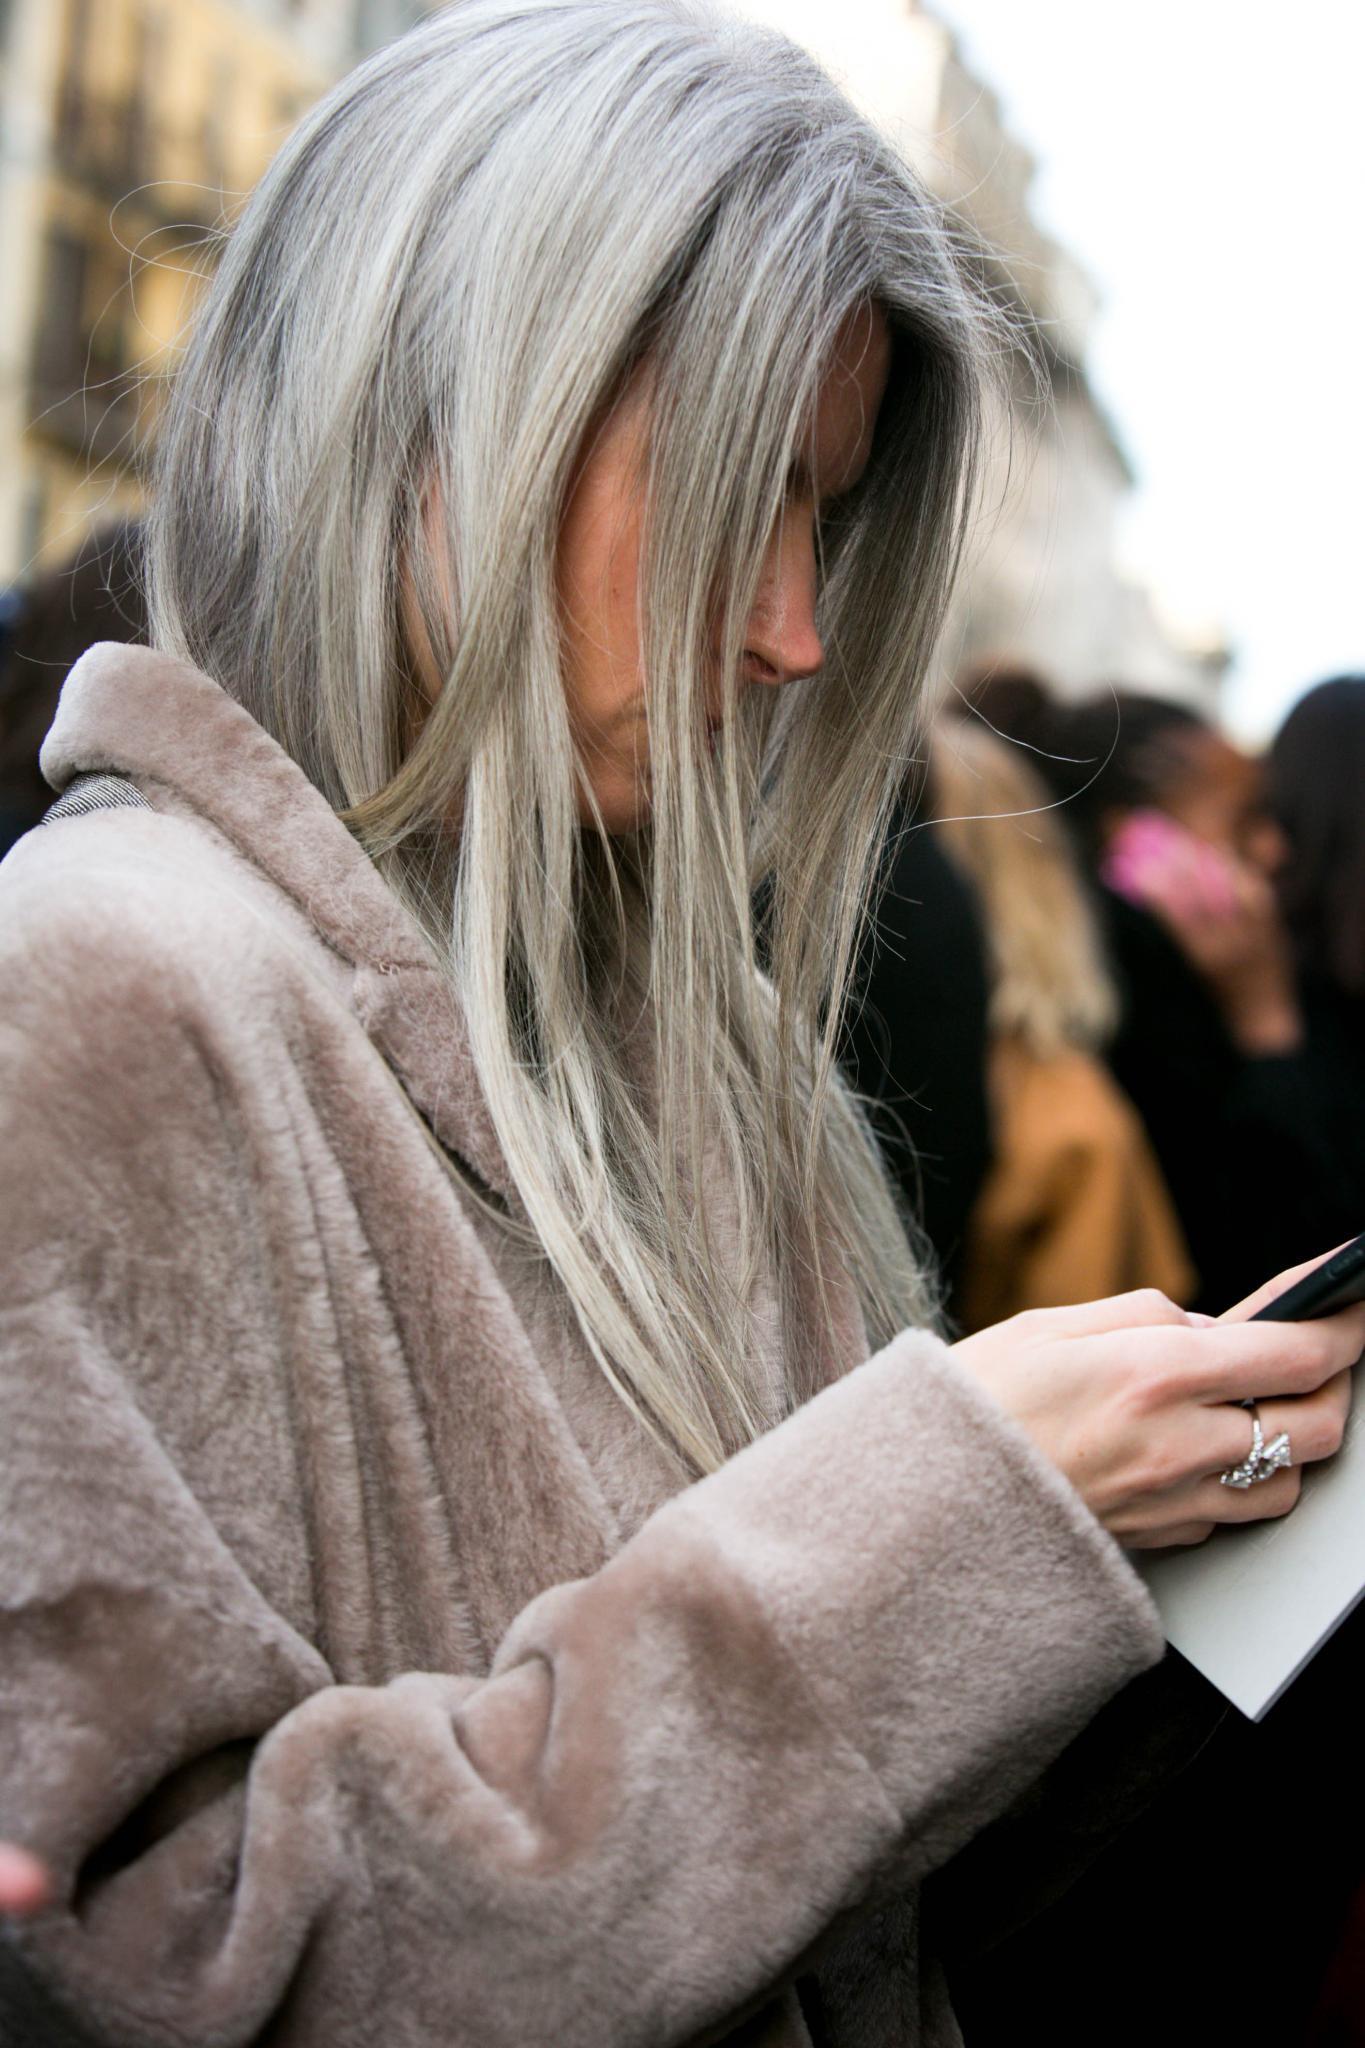 Woman with silver brown hair streaks in silver hair.